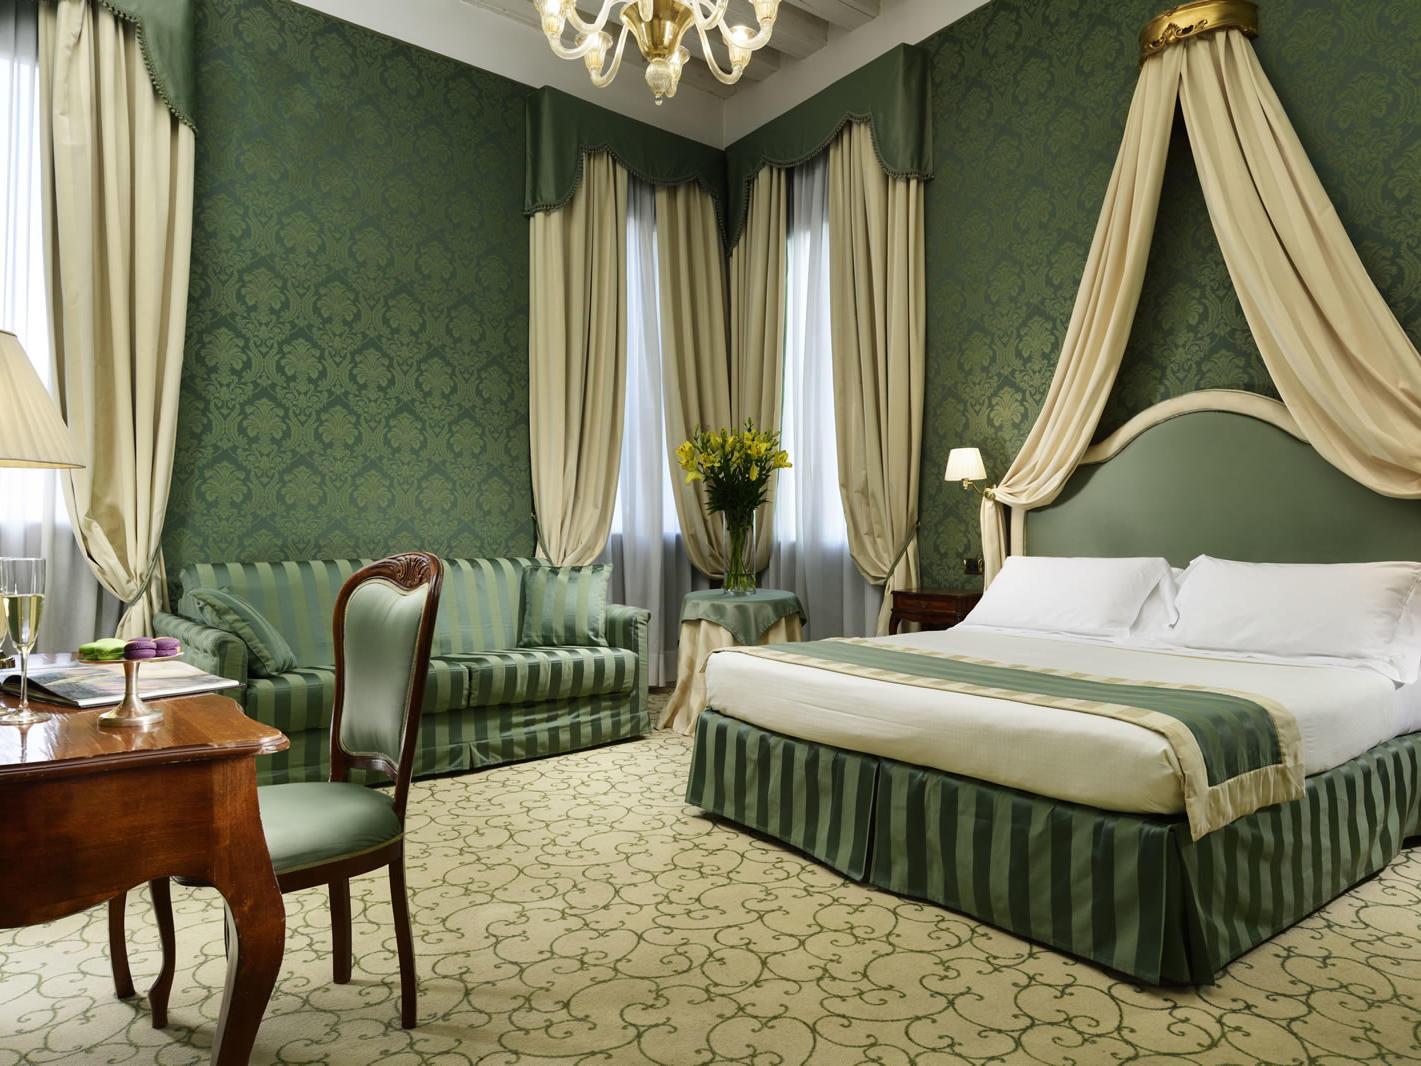 Executive Room | Maison Venezia